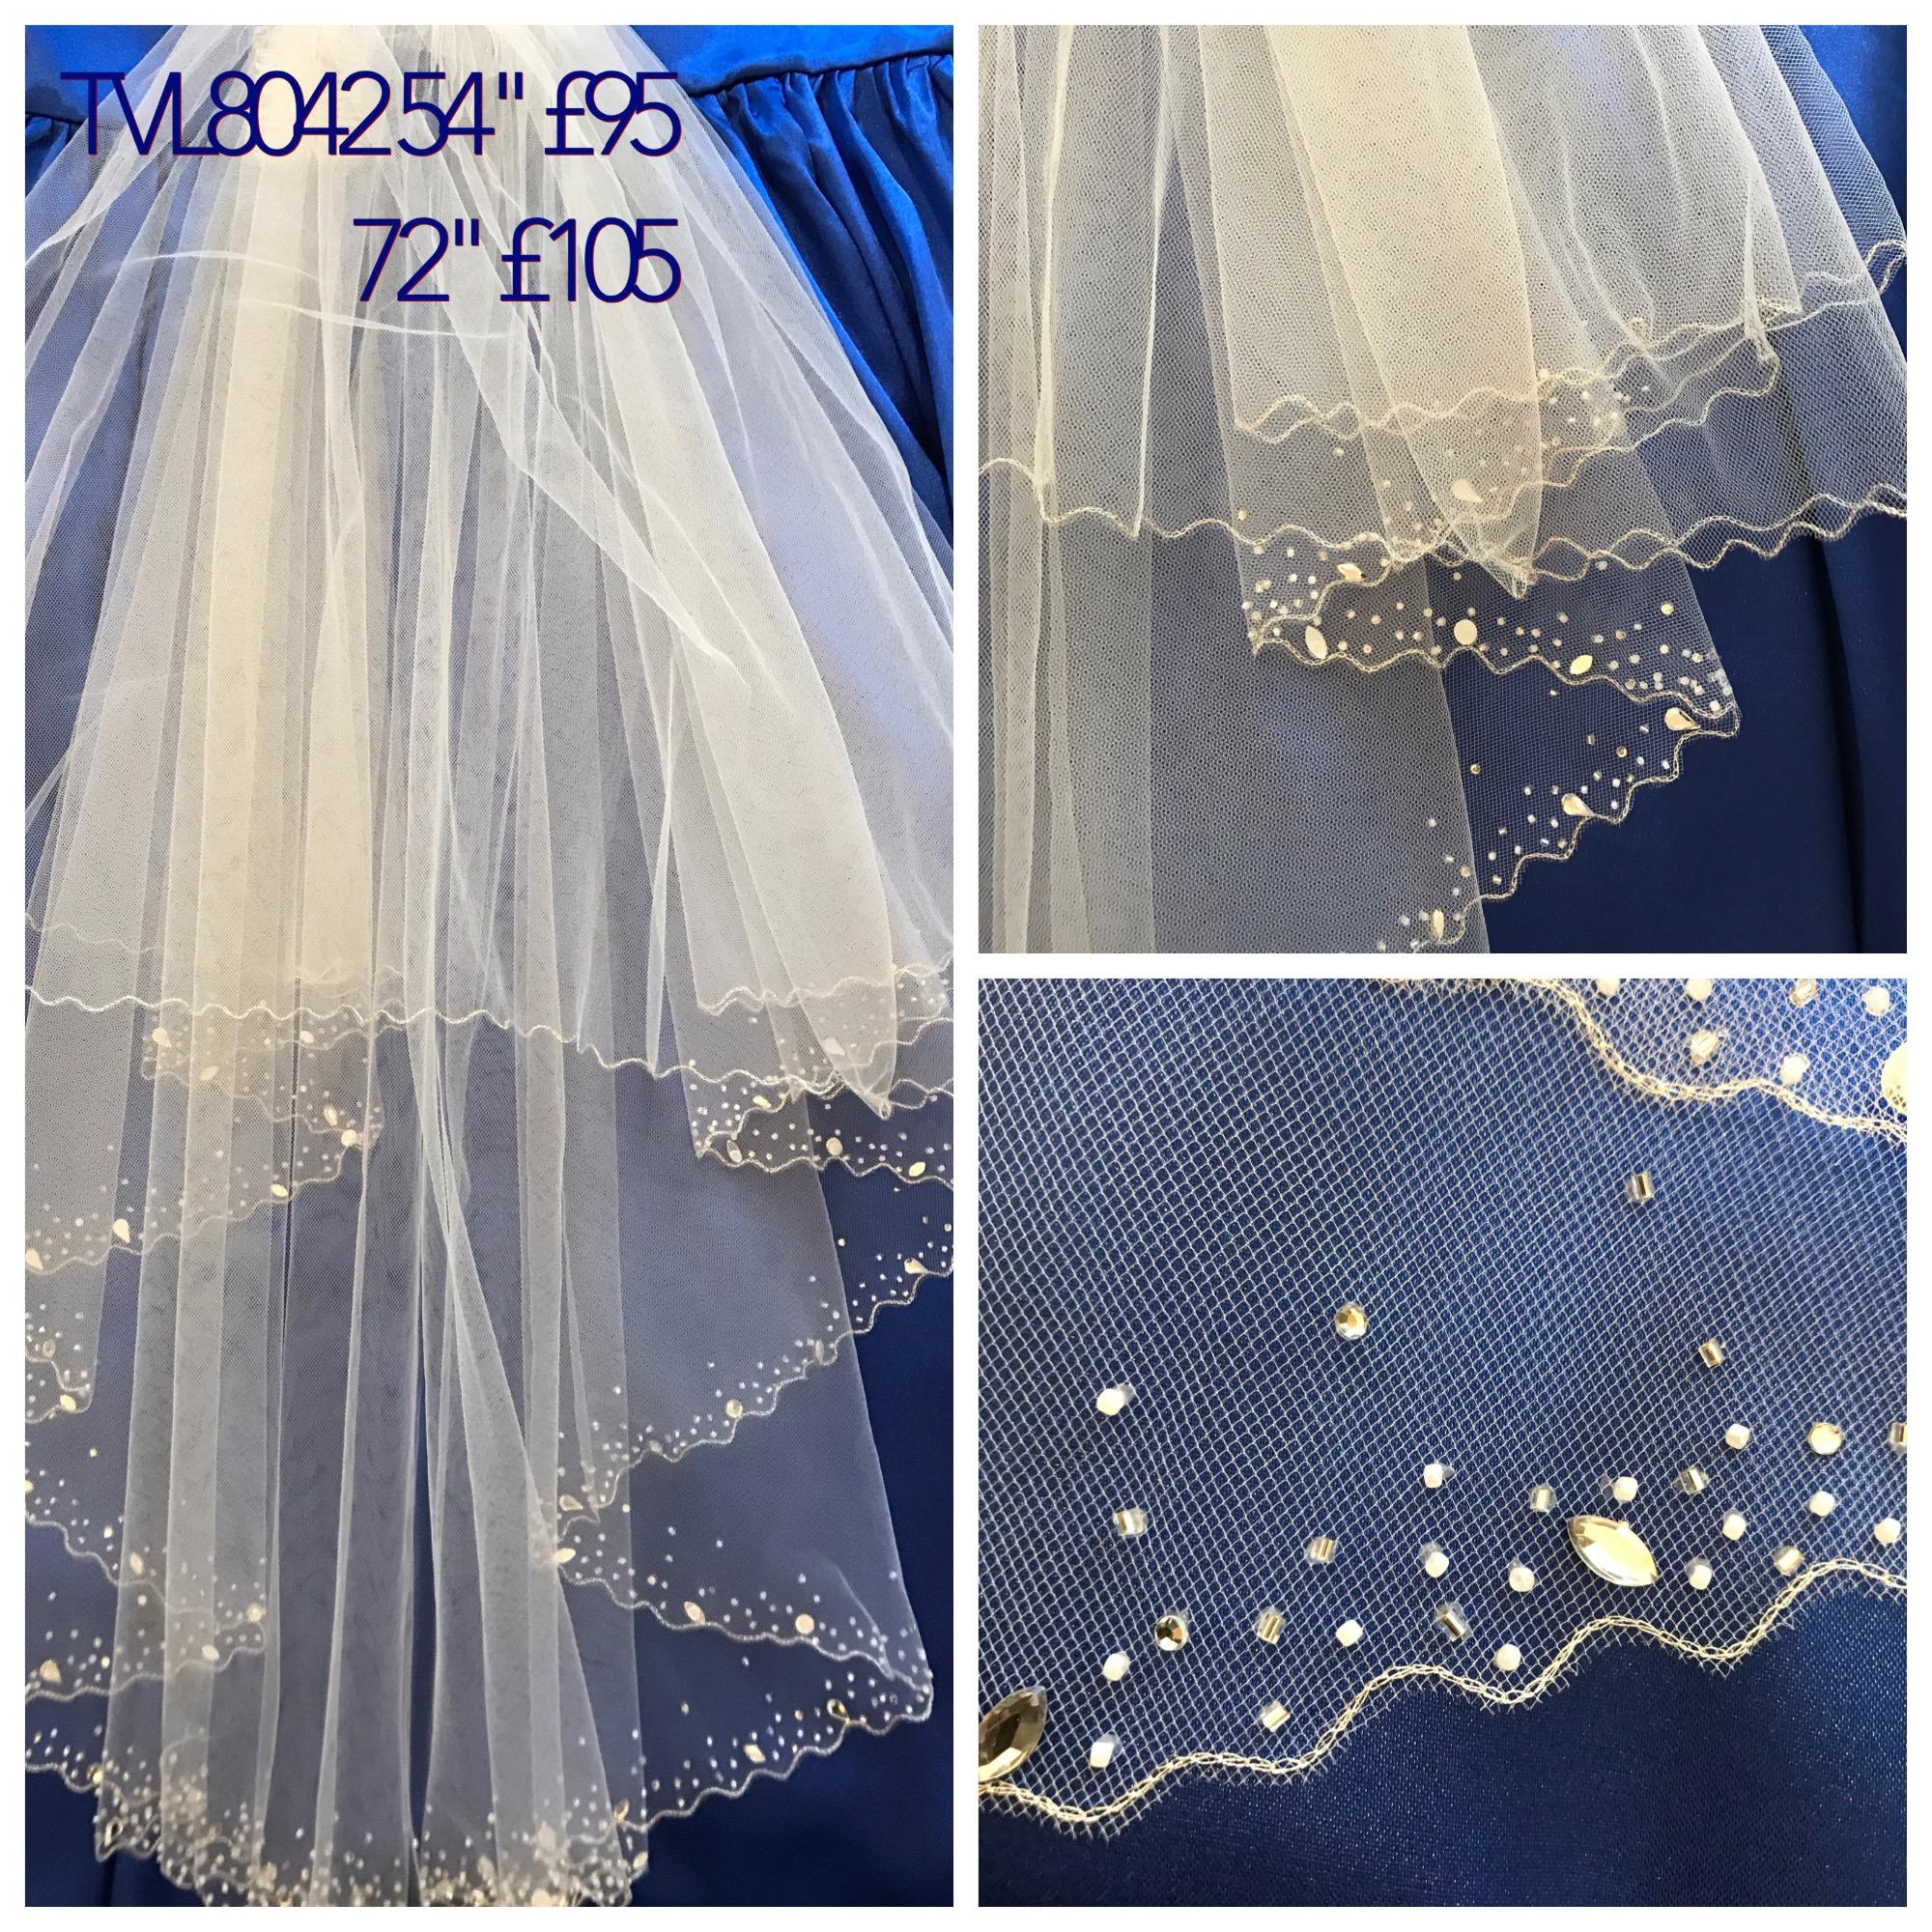 Plus size wedding dresses wedding dress milton keynes uk plus size wedding dresses wedding dress milton keynes uk about a bride plus size ombrellifo Images